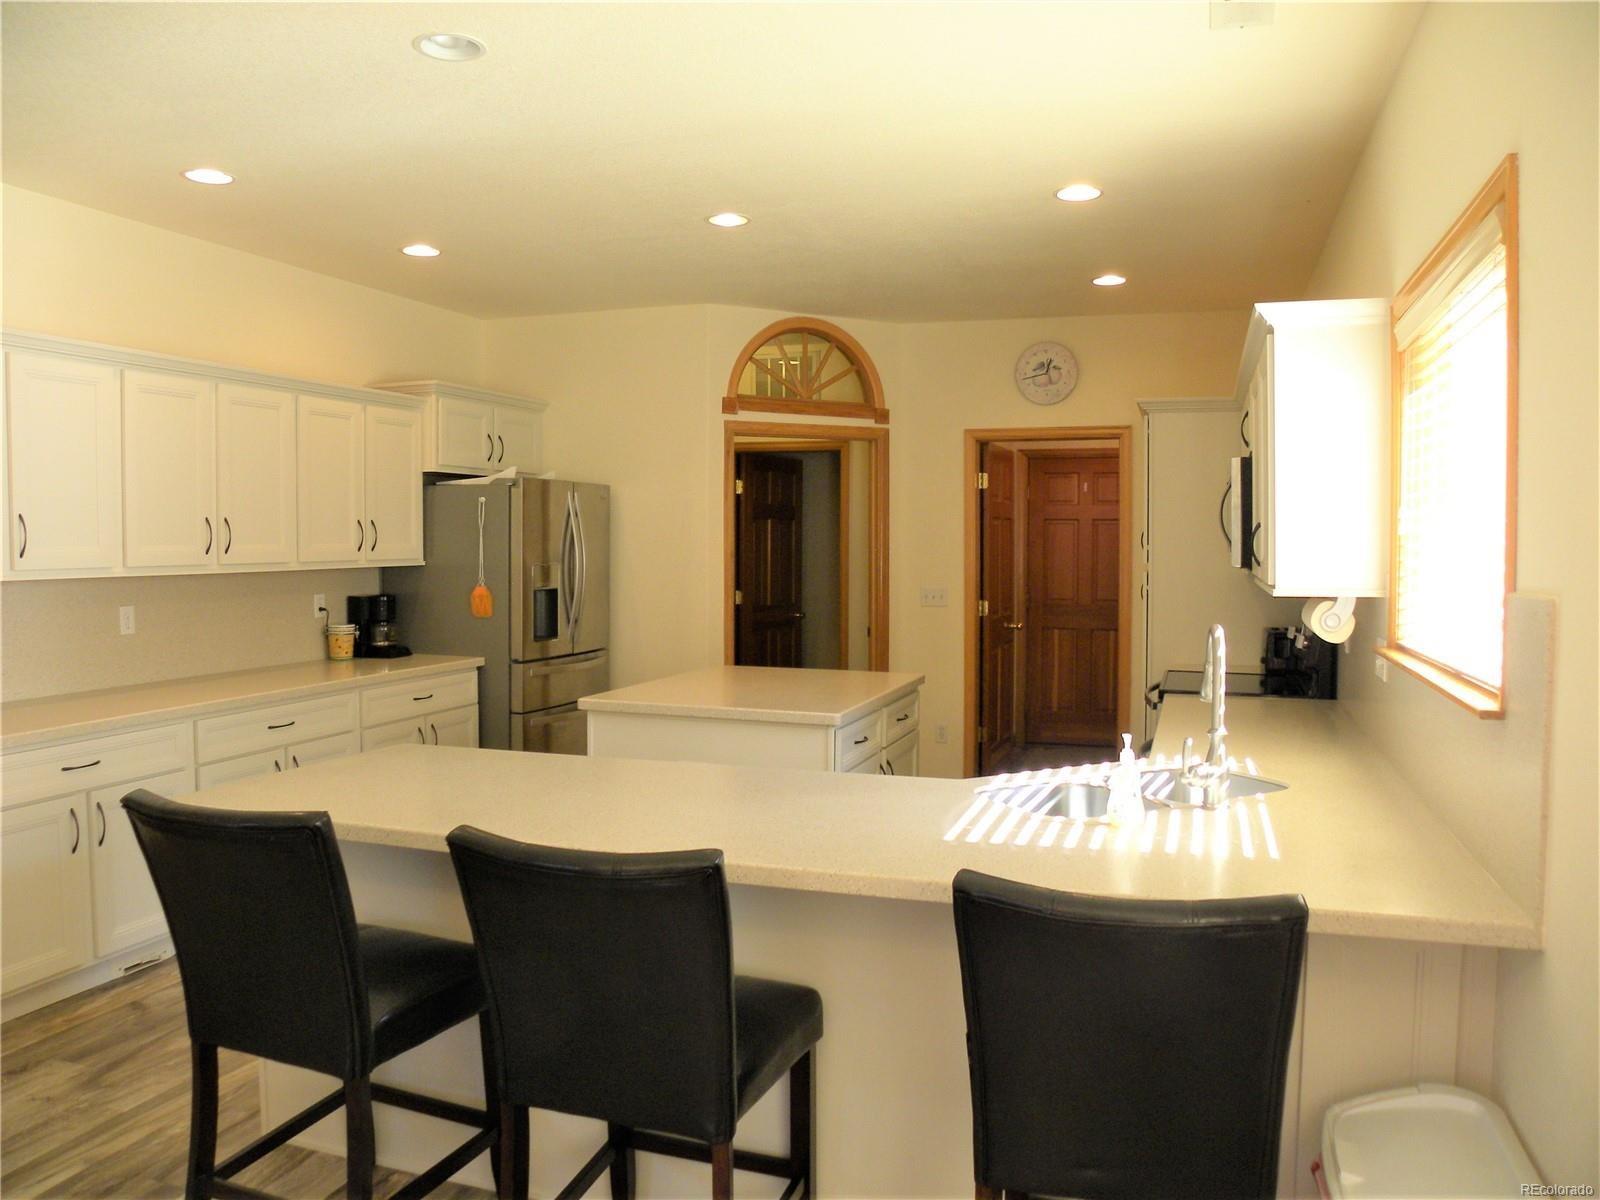 MLS# 5924977 - 5 - 1017 Cedarcrest Drive, Pueblo, CO 81005